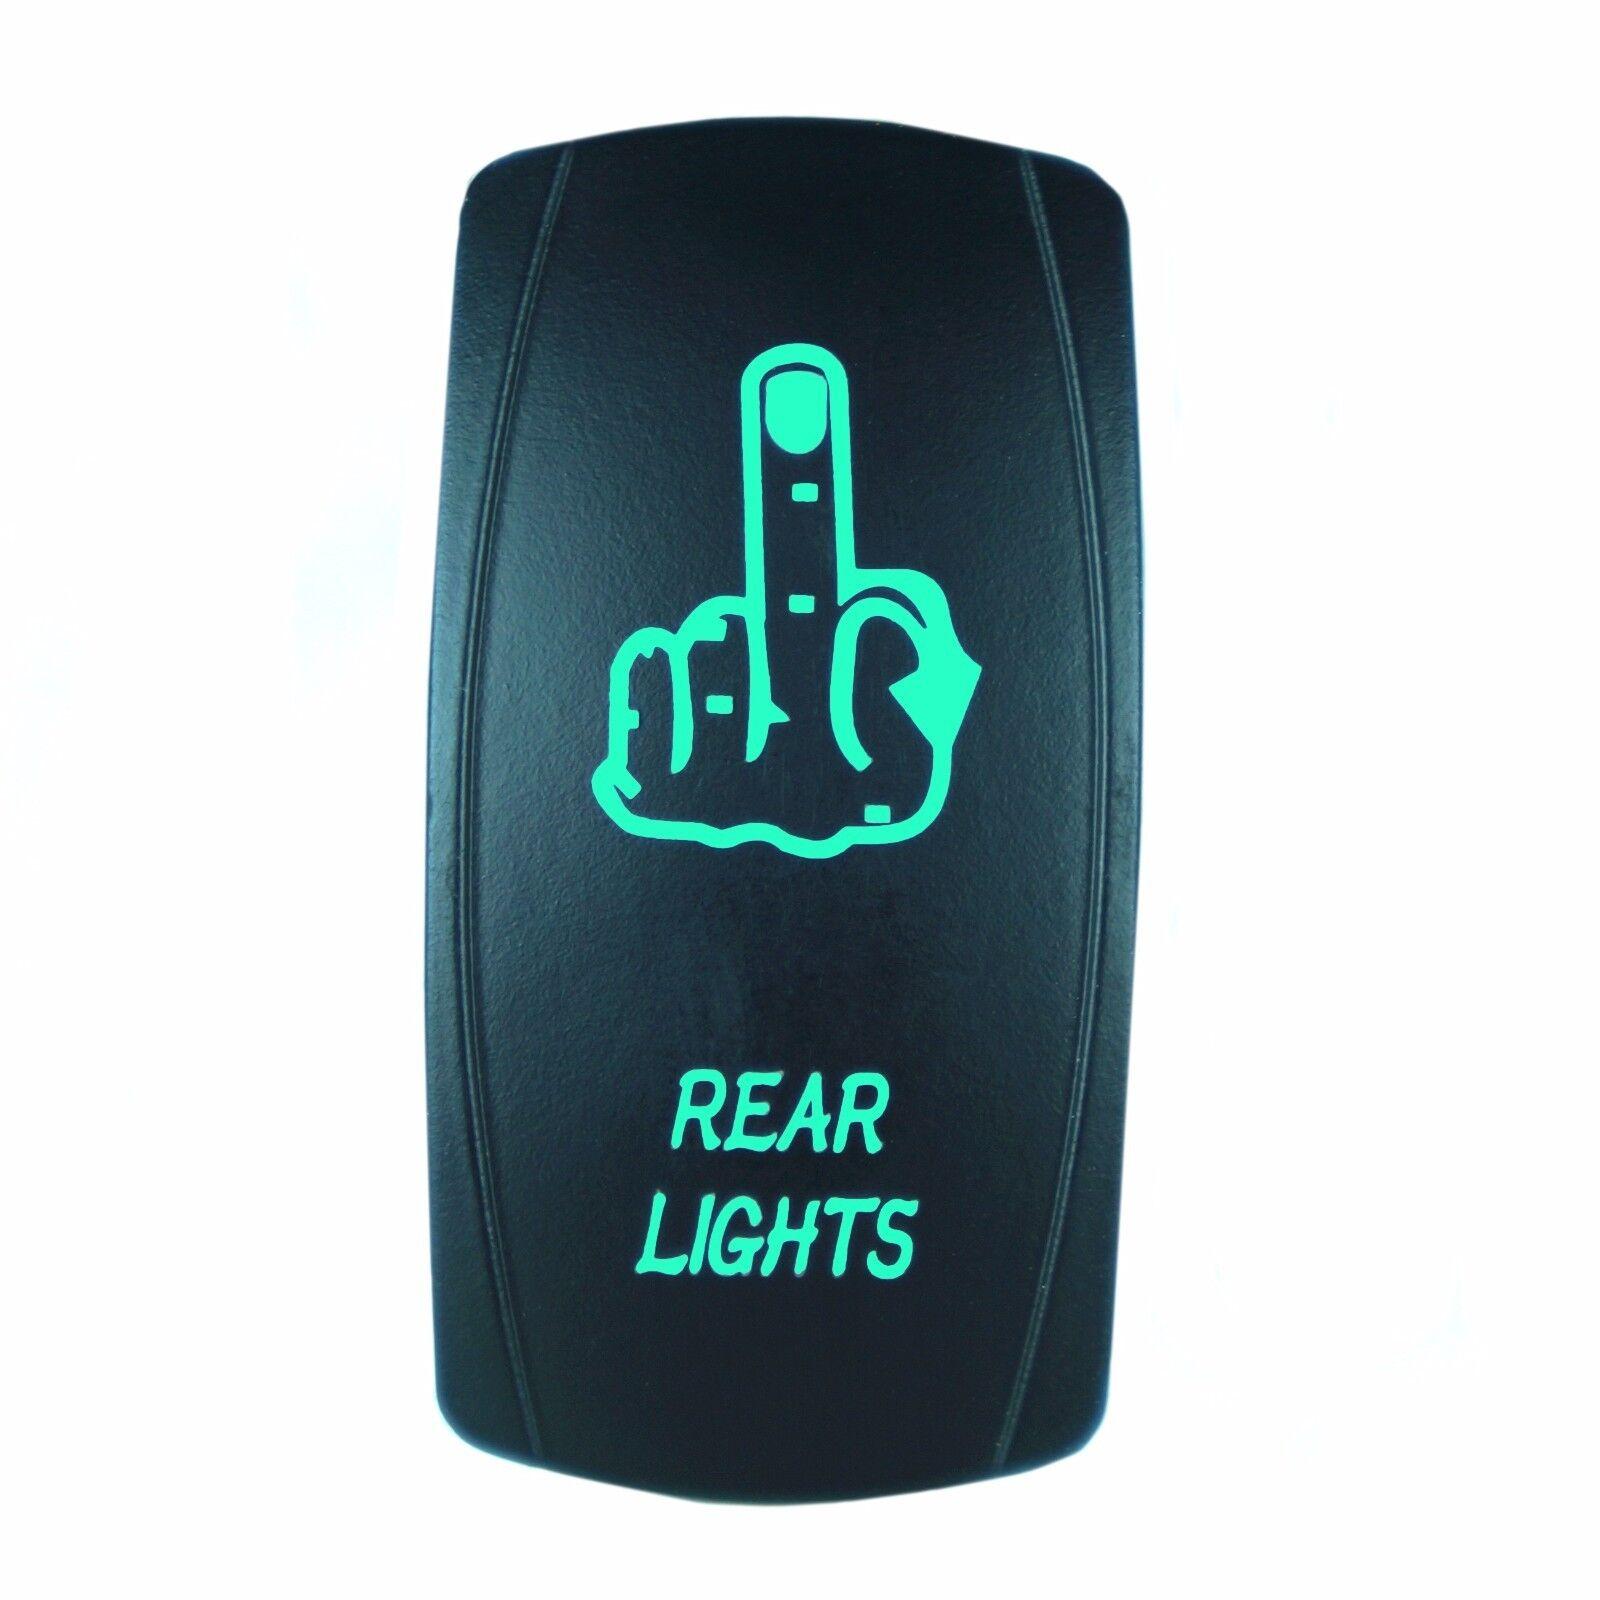 Laser FINGER REAR LIGHTS Rocker Switch ON-OFF led Light 20A 12V 5pin GREEN